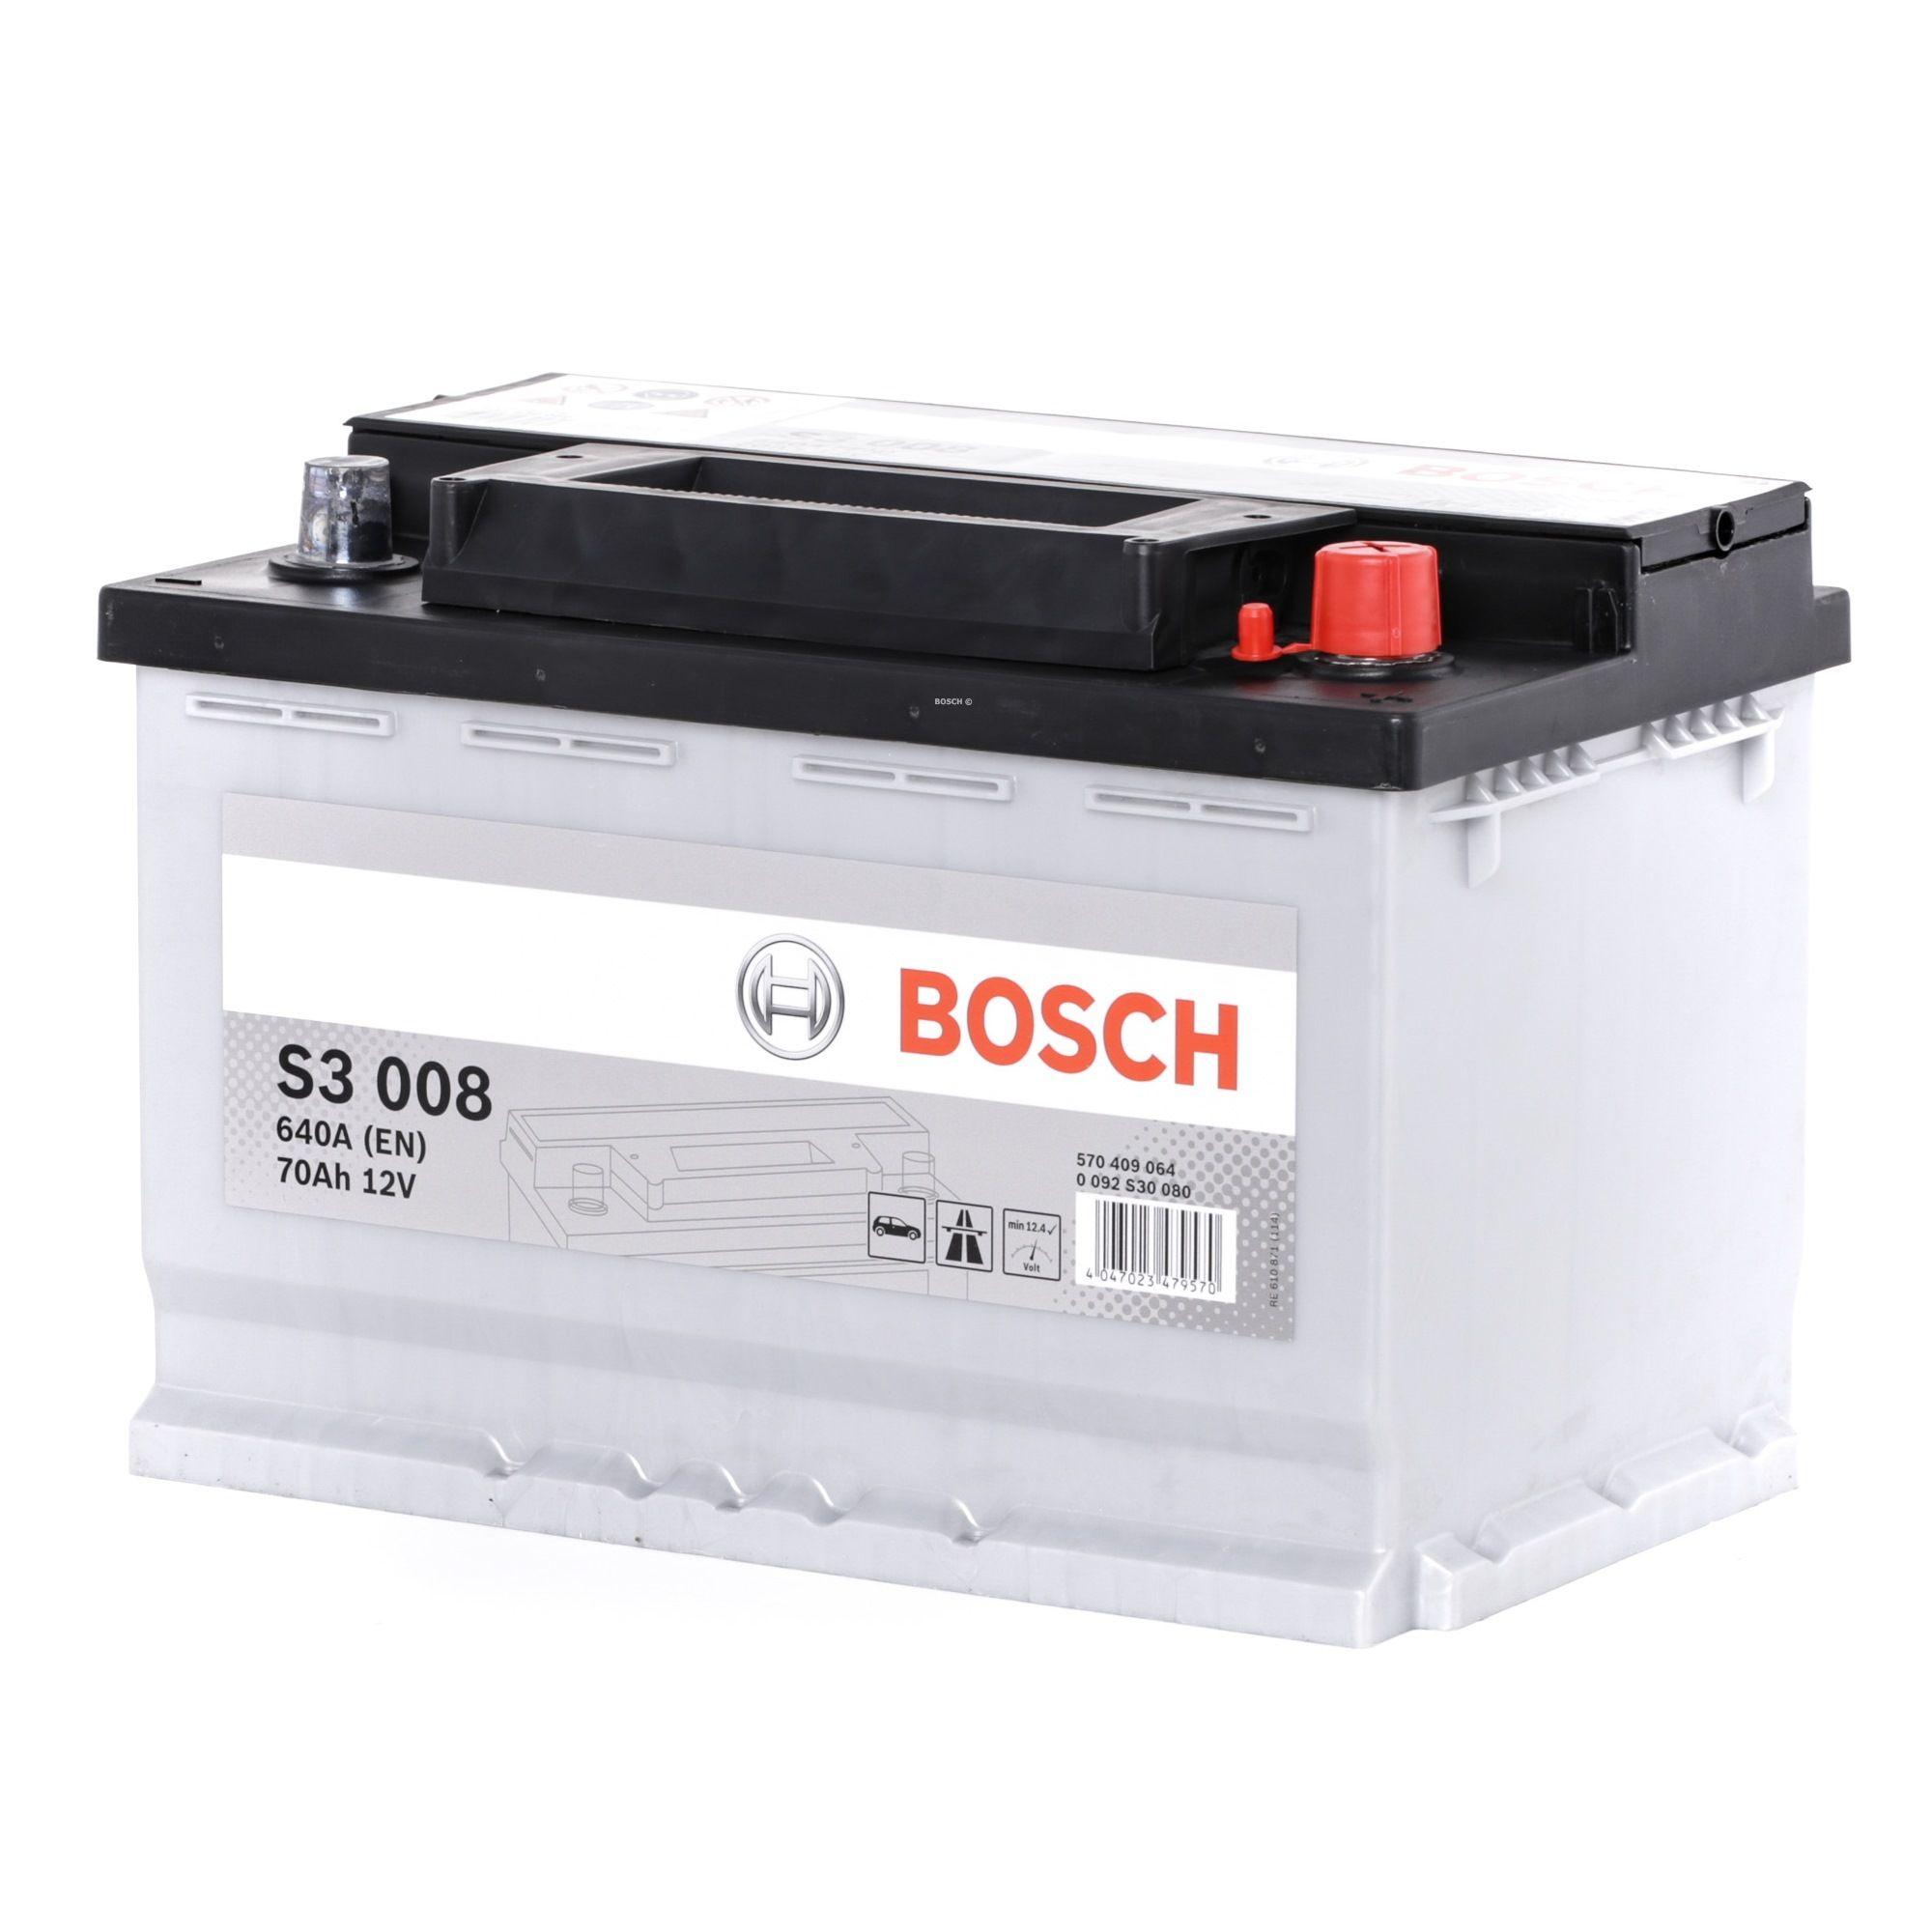 NISSAN TRADE 1995 Kfz-Elektroniksysteme - Original BOSCH 0 092 S30 080 Kälteprüfstrom EN: 640A, Spannung: 12V, Polanordnung: 0